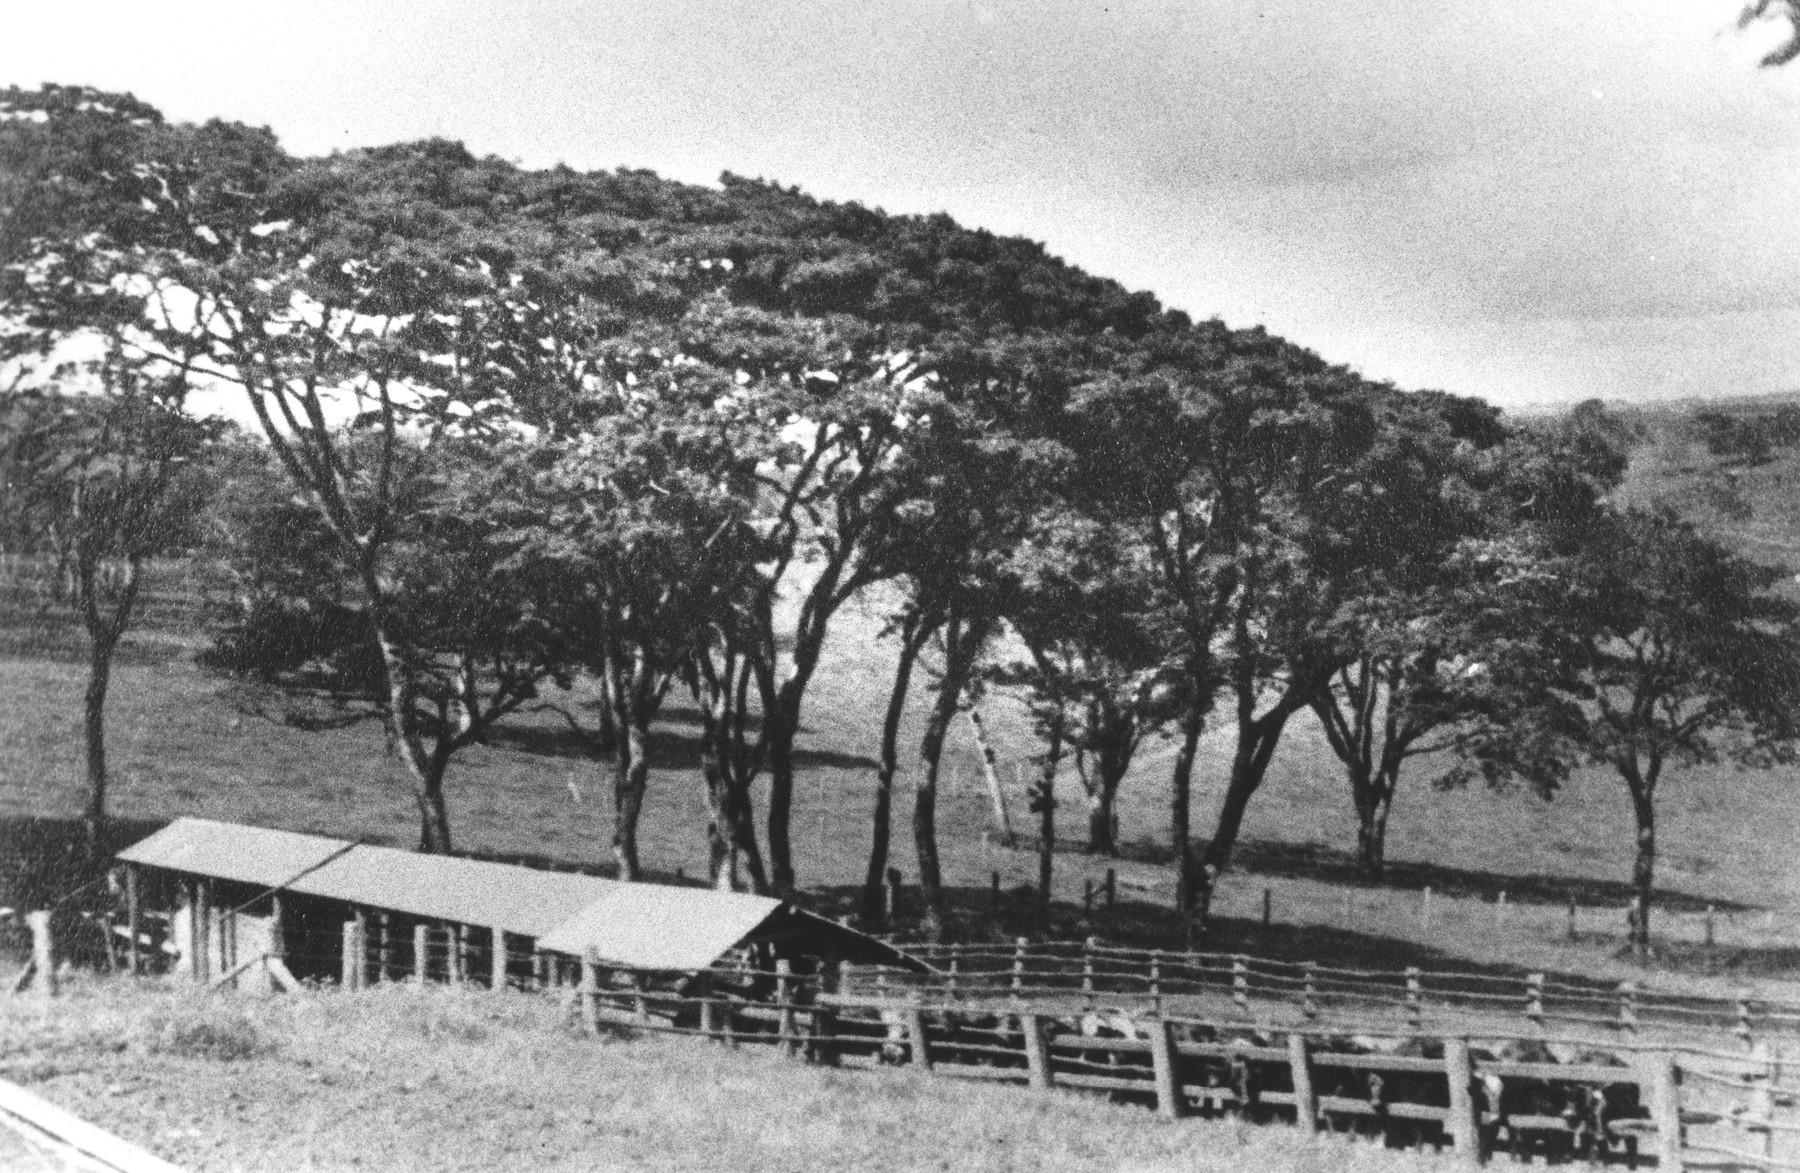 View of the Berg farm near Limuru, Kenya (Kiambu district), where the German Jewish family found refuge during World War II.